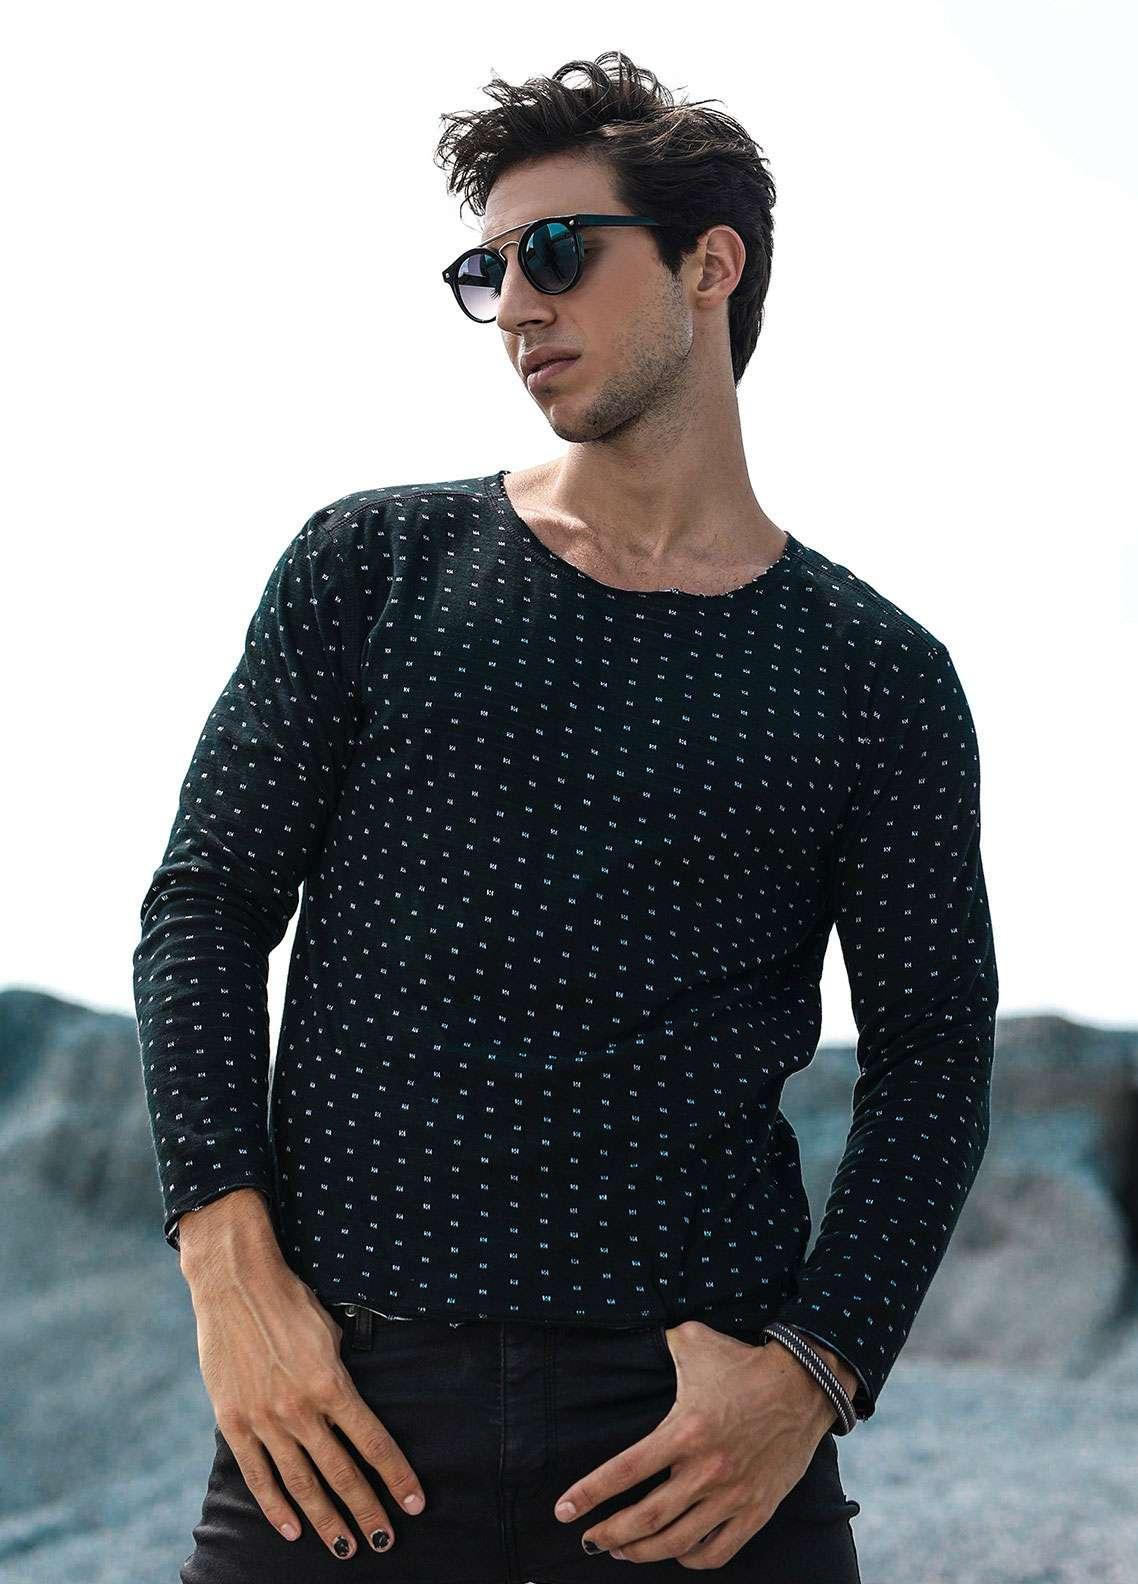 Furor Jersey Casual Sweatshirts for Men - Black 017221